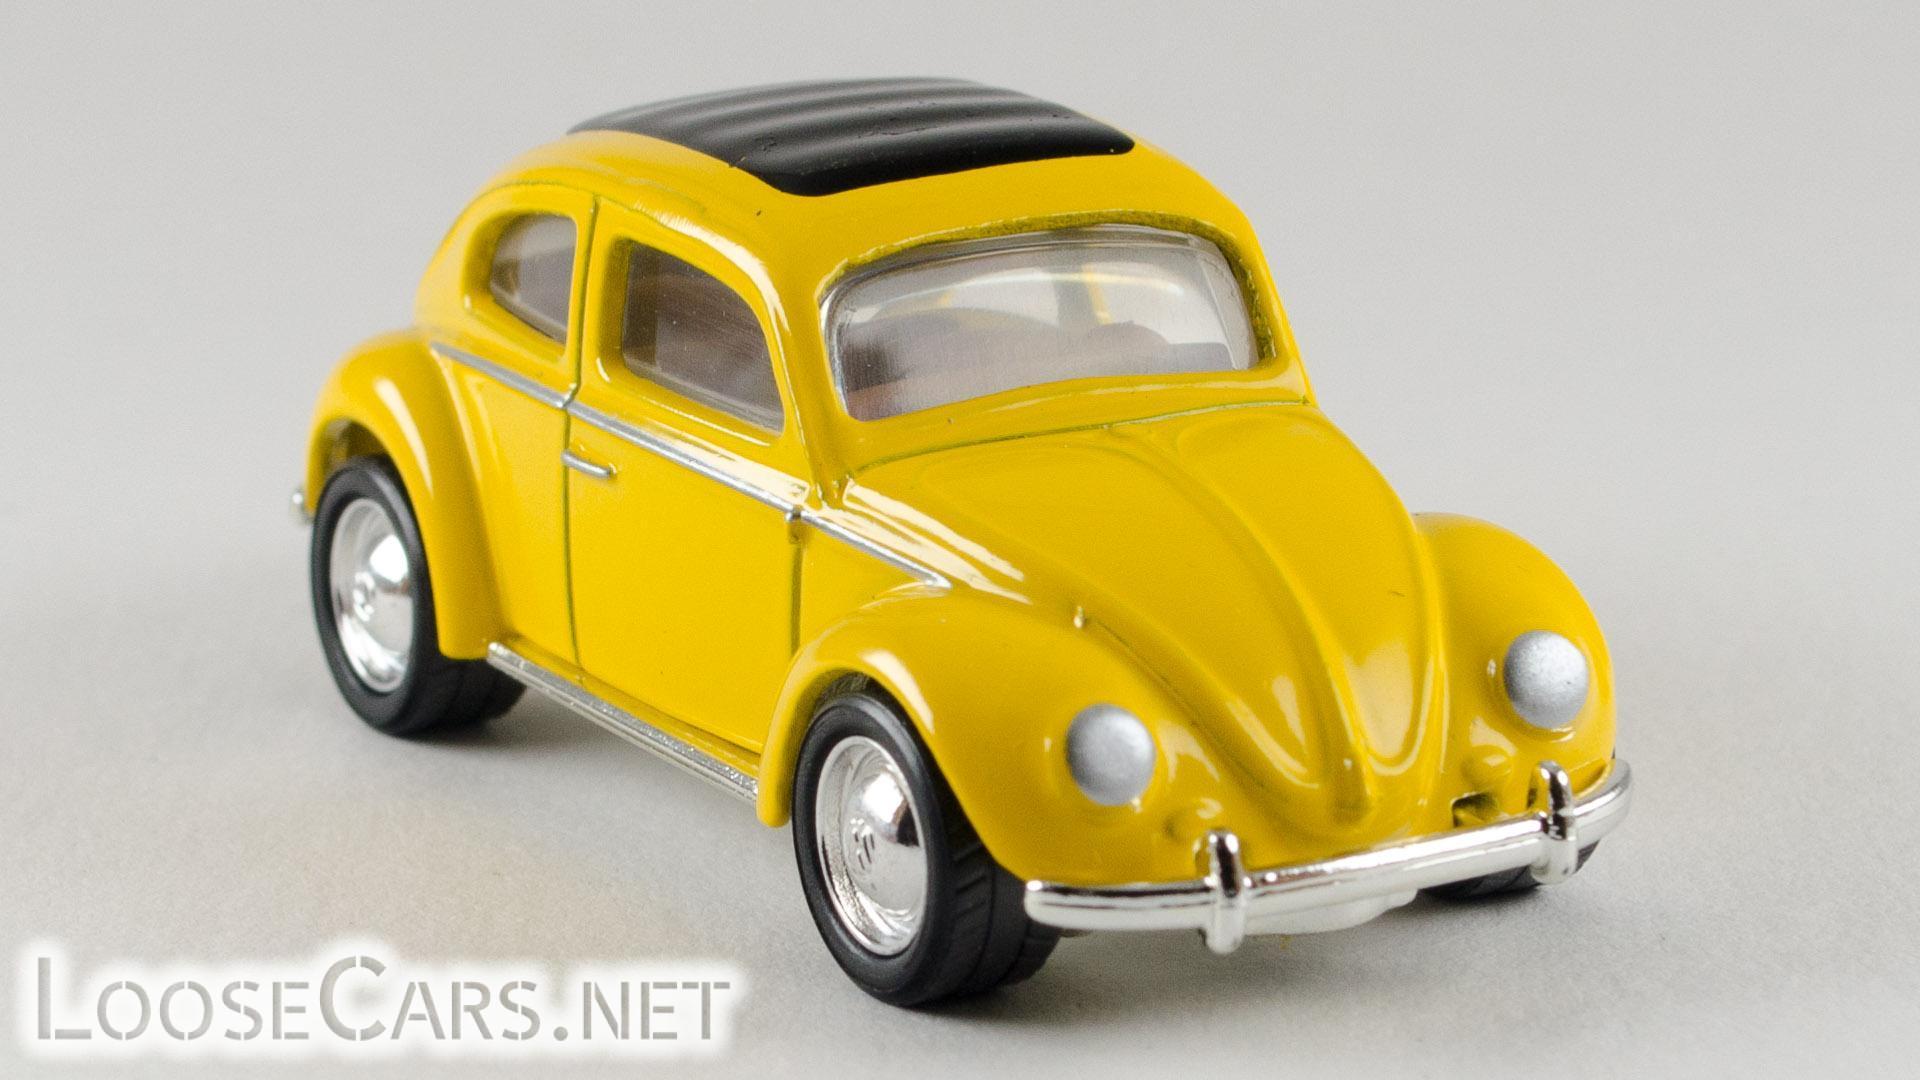 Matchbox 1962 VW Beetle: 2000 FAO Schwarz Front Right